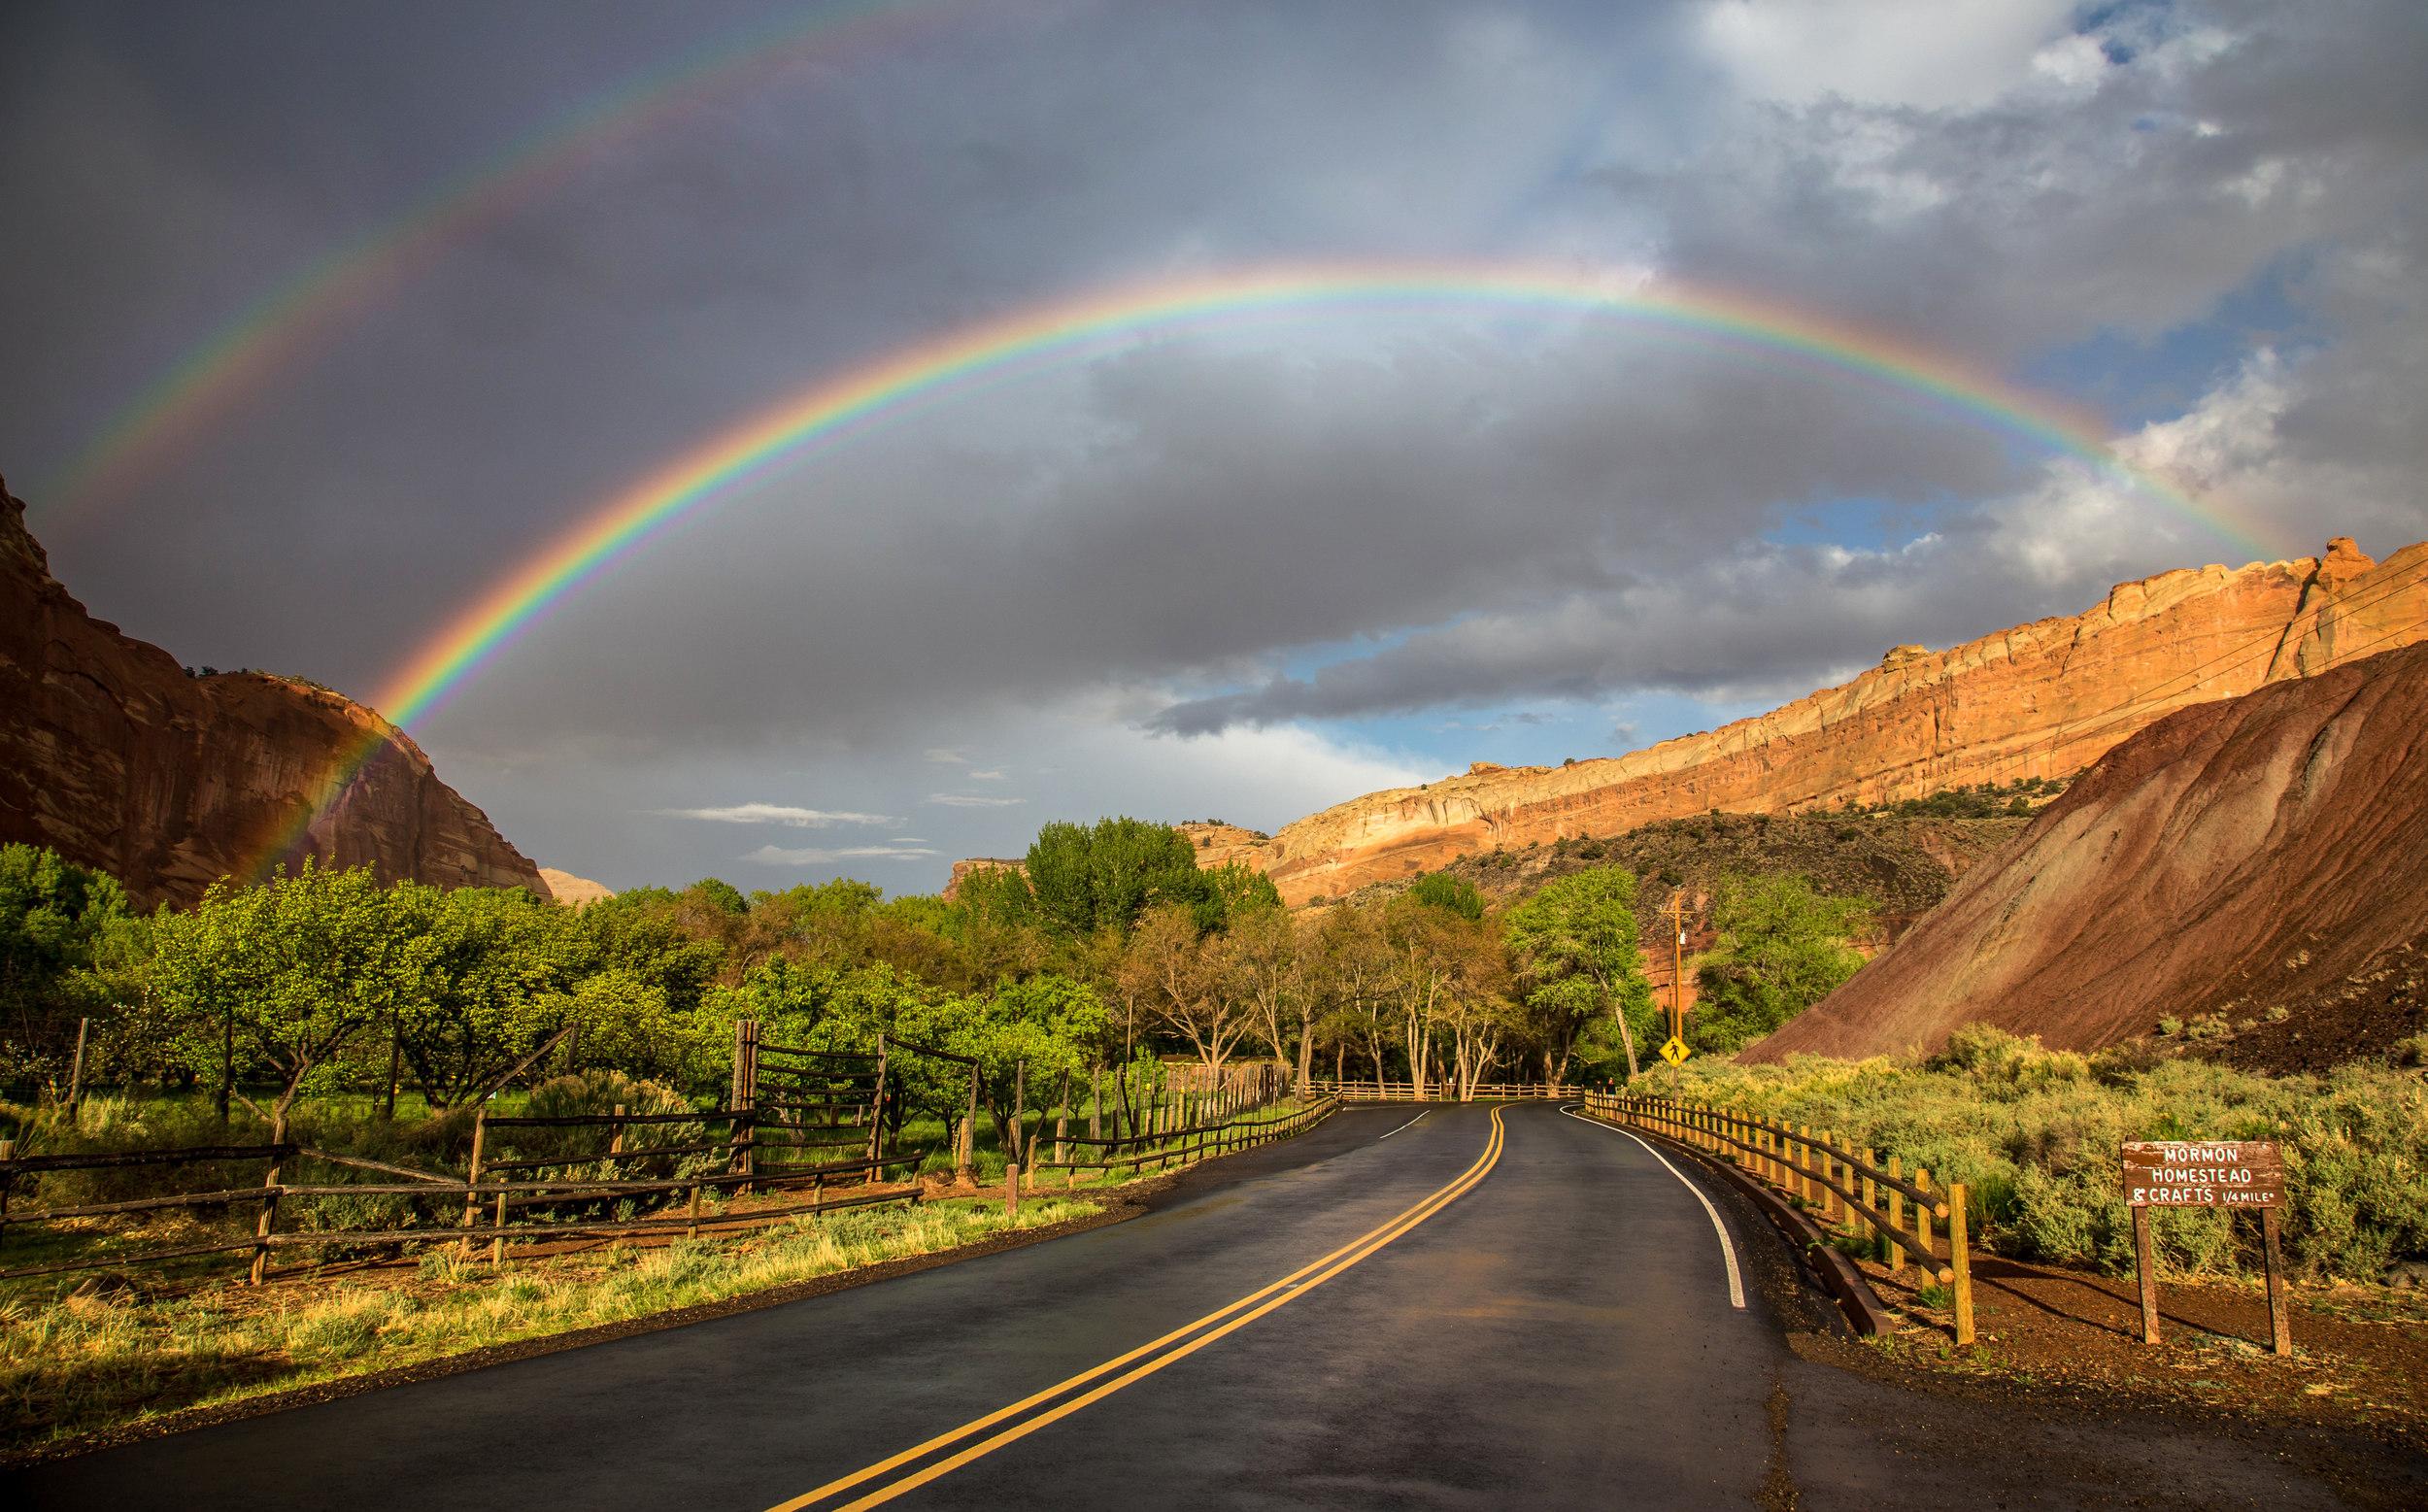 RAINBOW NEAR THE ORCHARDS –(PHOTO: PETERCLERC/SHUTTERSTOCK)